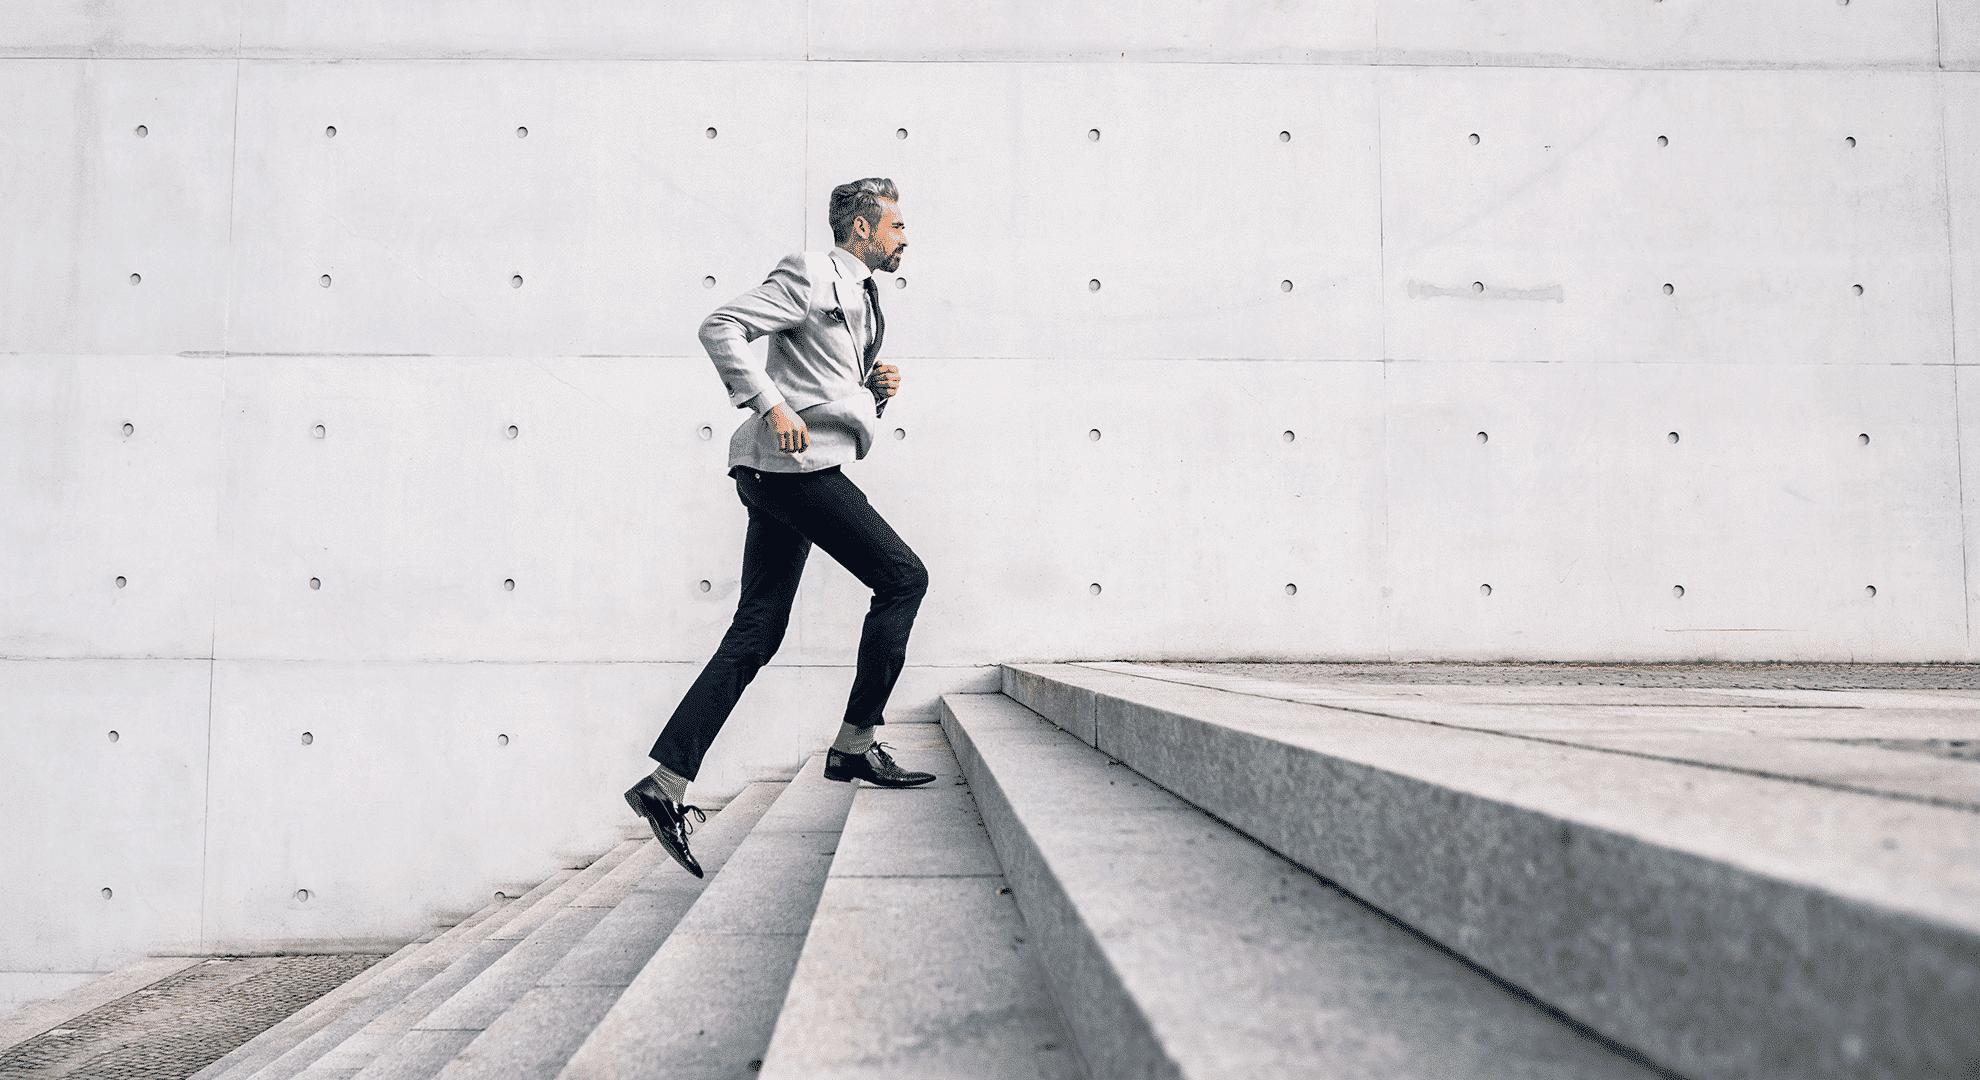 Mann in modernem Fashion-Anzug läuft Treppe hinauf